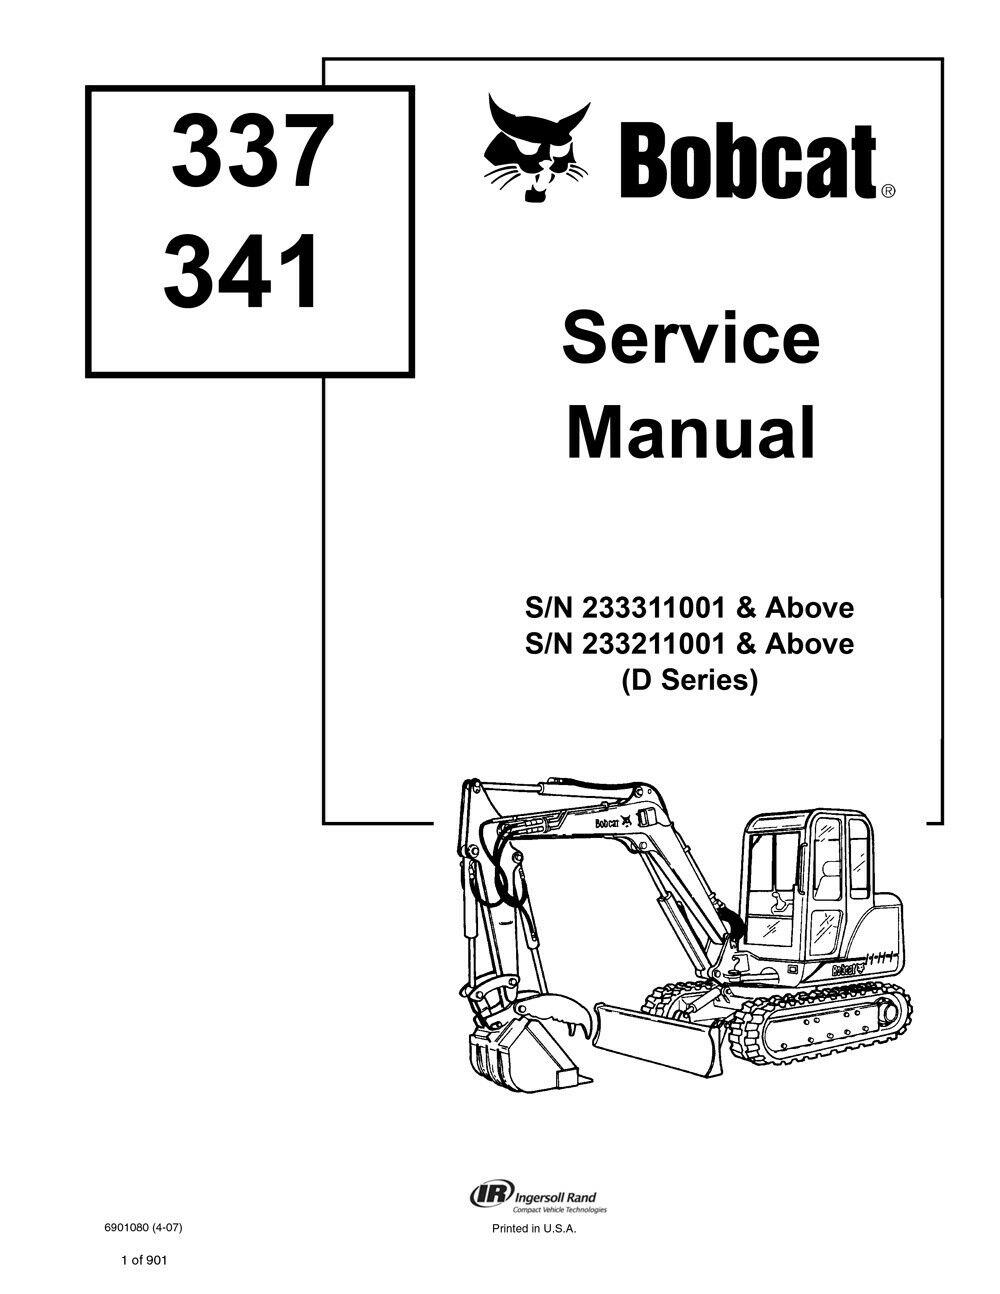 Bobcat 337 341 Excavator New 2007 Edition D-Series Service